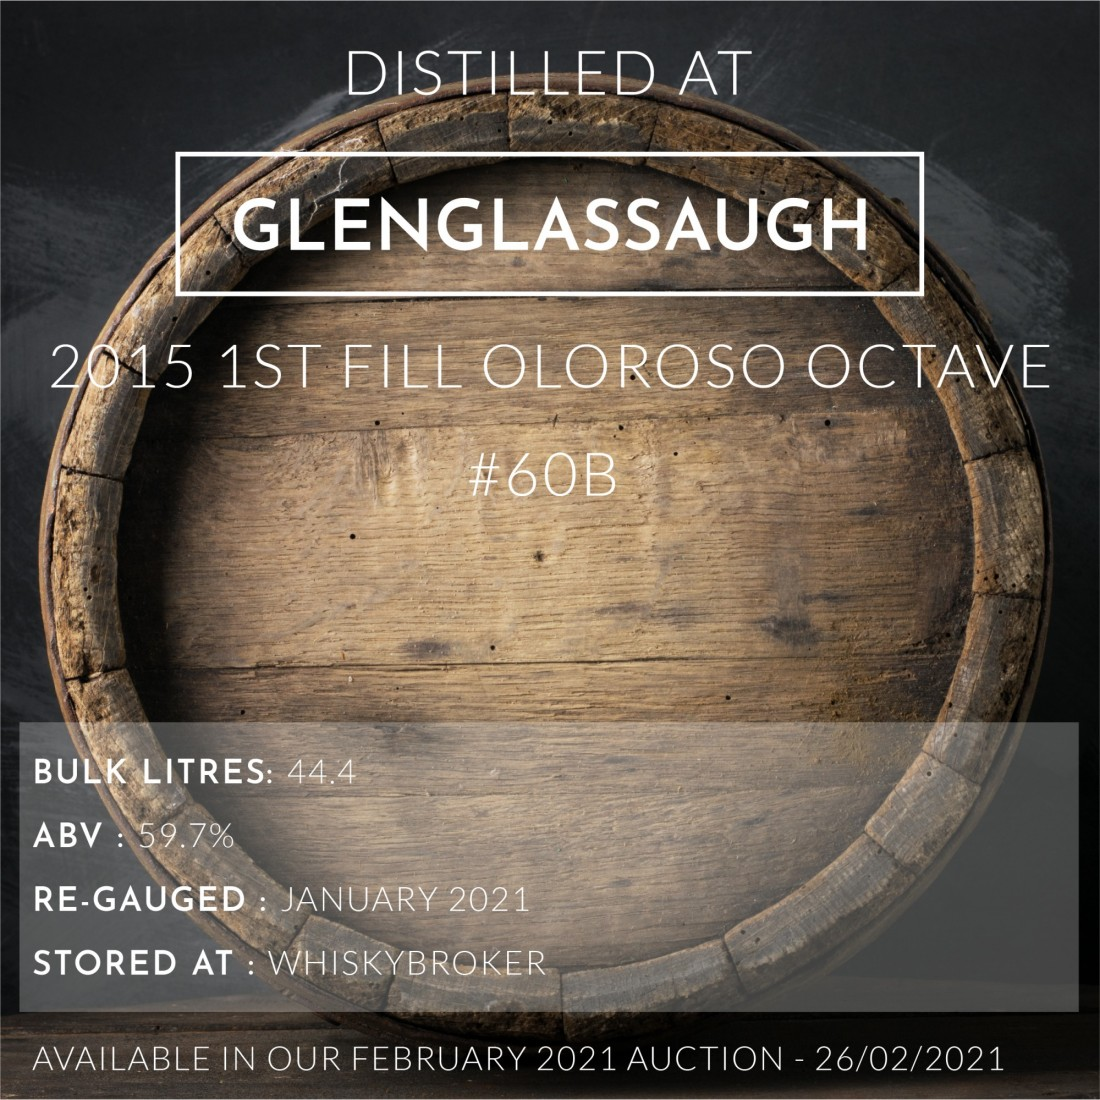 1 Glenglassaugh 2015 1st Fill Oloroso Octave #60B / Cask in storage at Whiskybroker